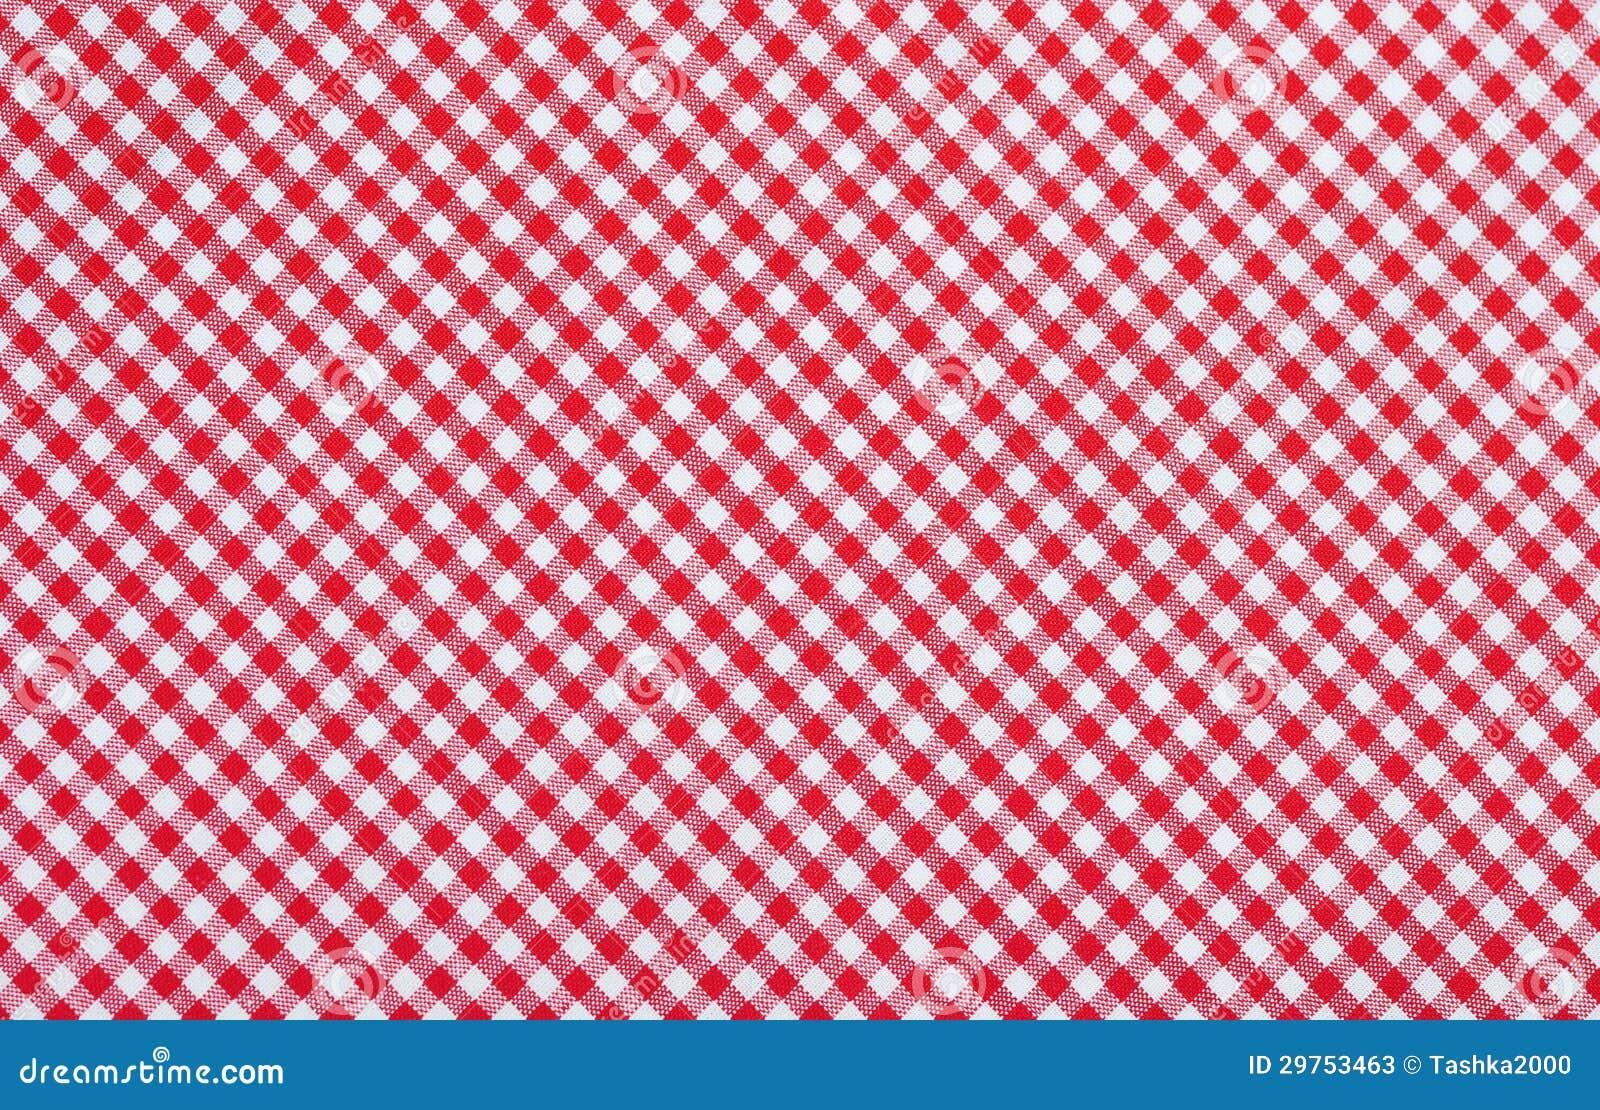 checkered flag border wallpaper